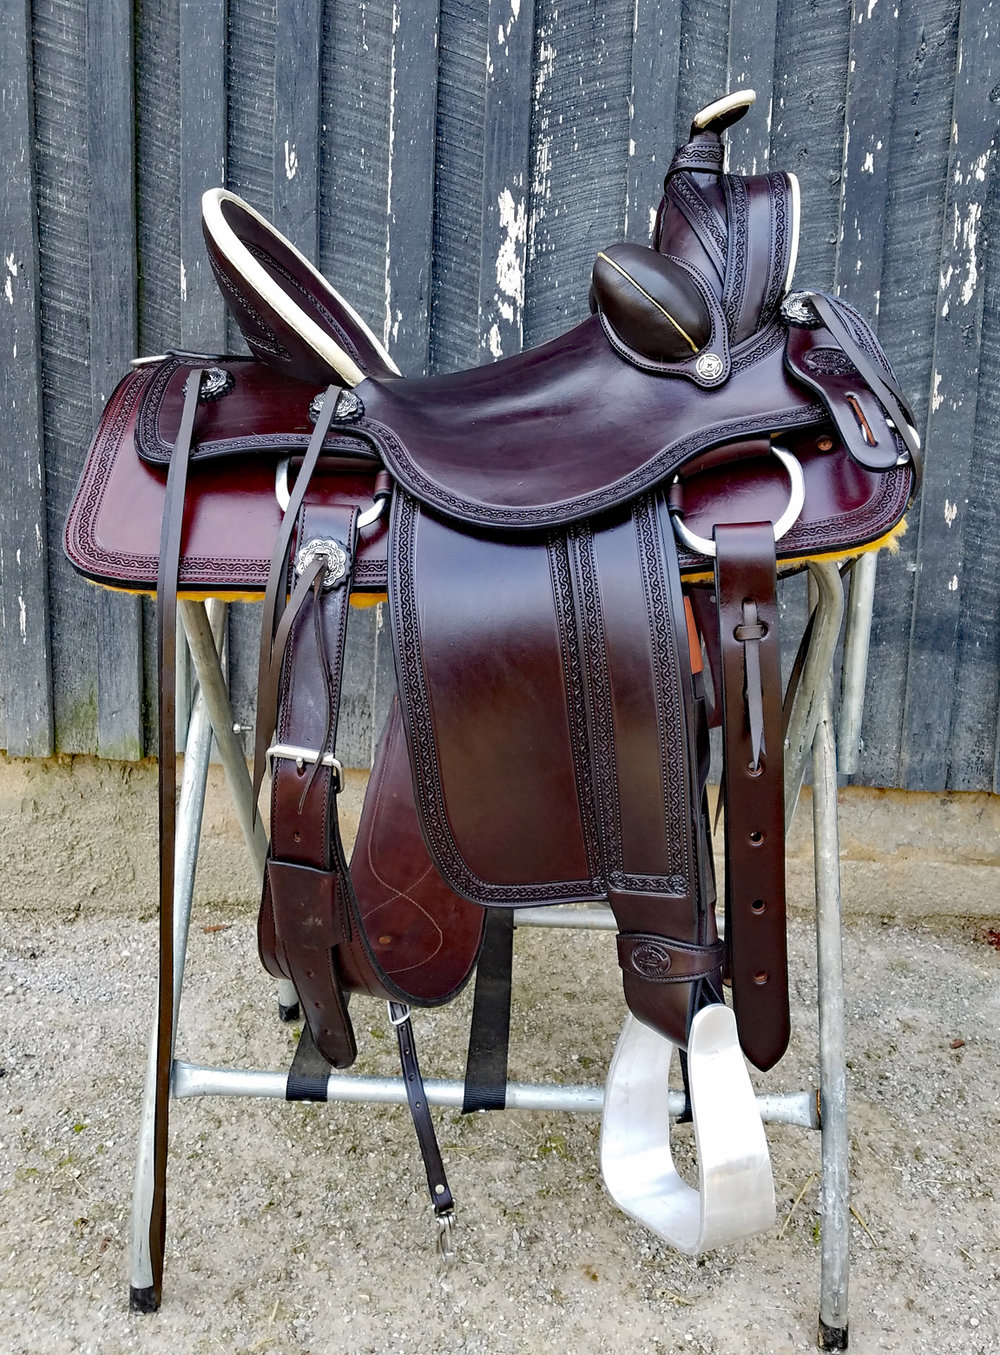 Eli Miller Custom Vaquero Saddle - Custom Made Vaquero Saddle handcrafted by Eli Miller. 16